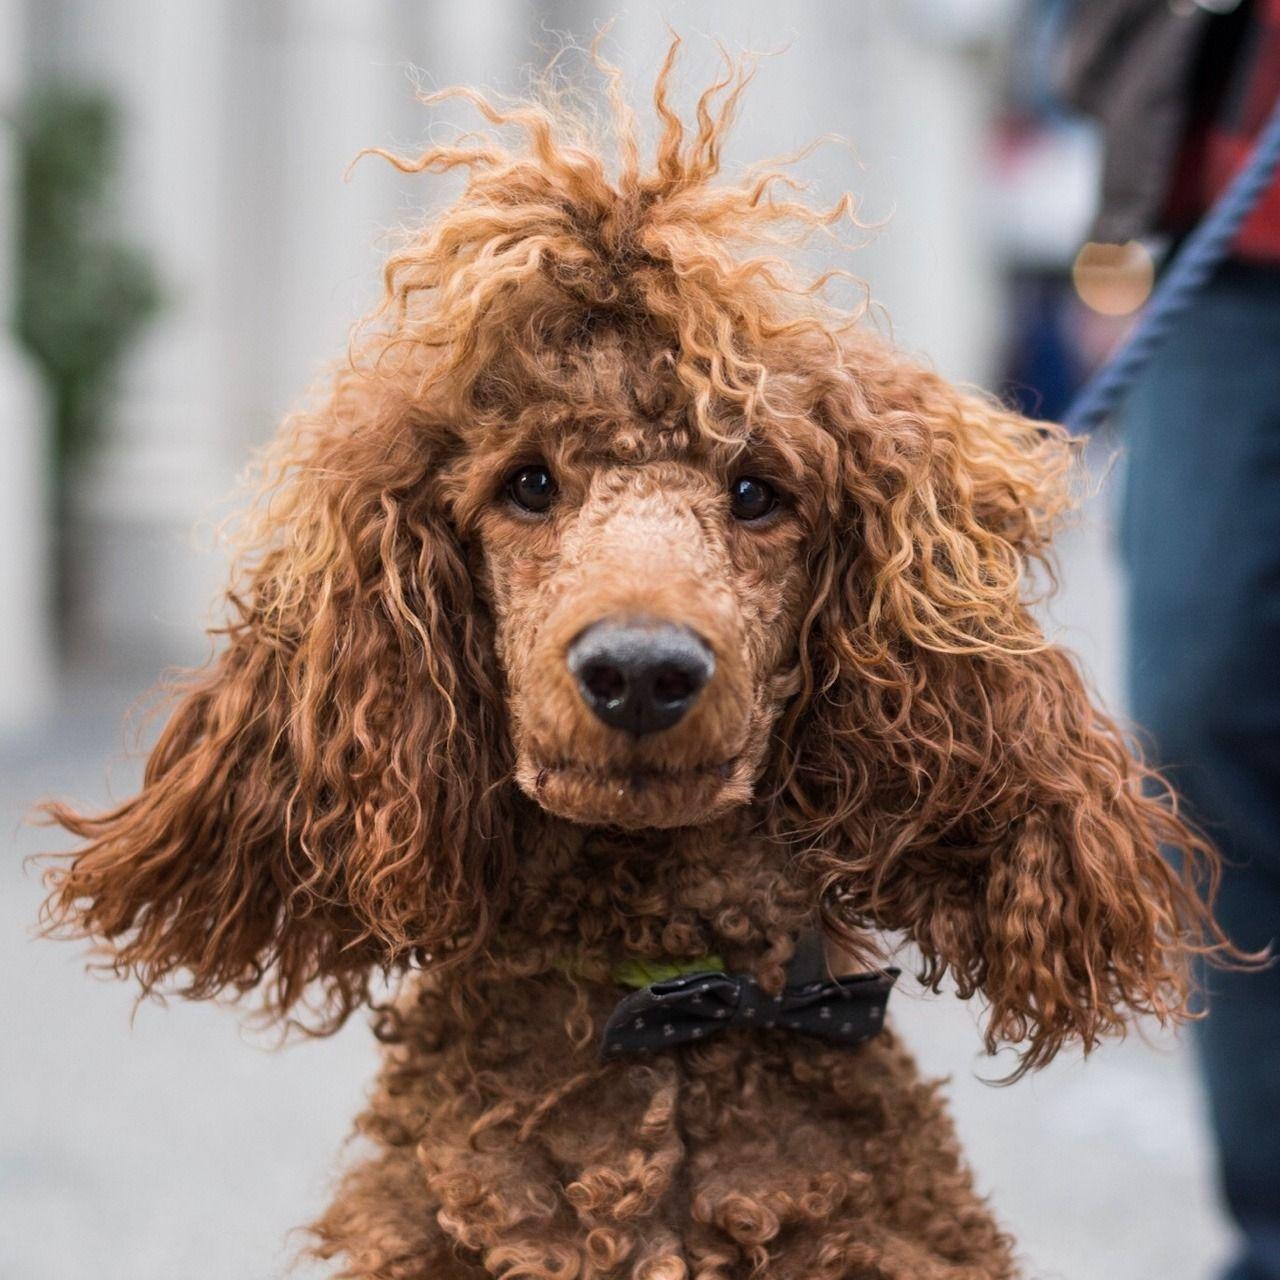 Sasquatch Standard Poodle 3 Y O Broome Mercer St New York